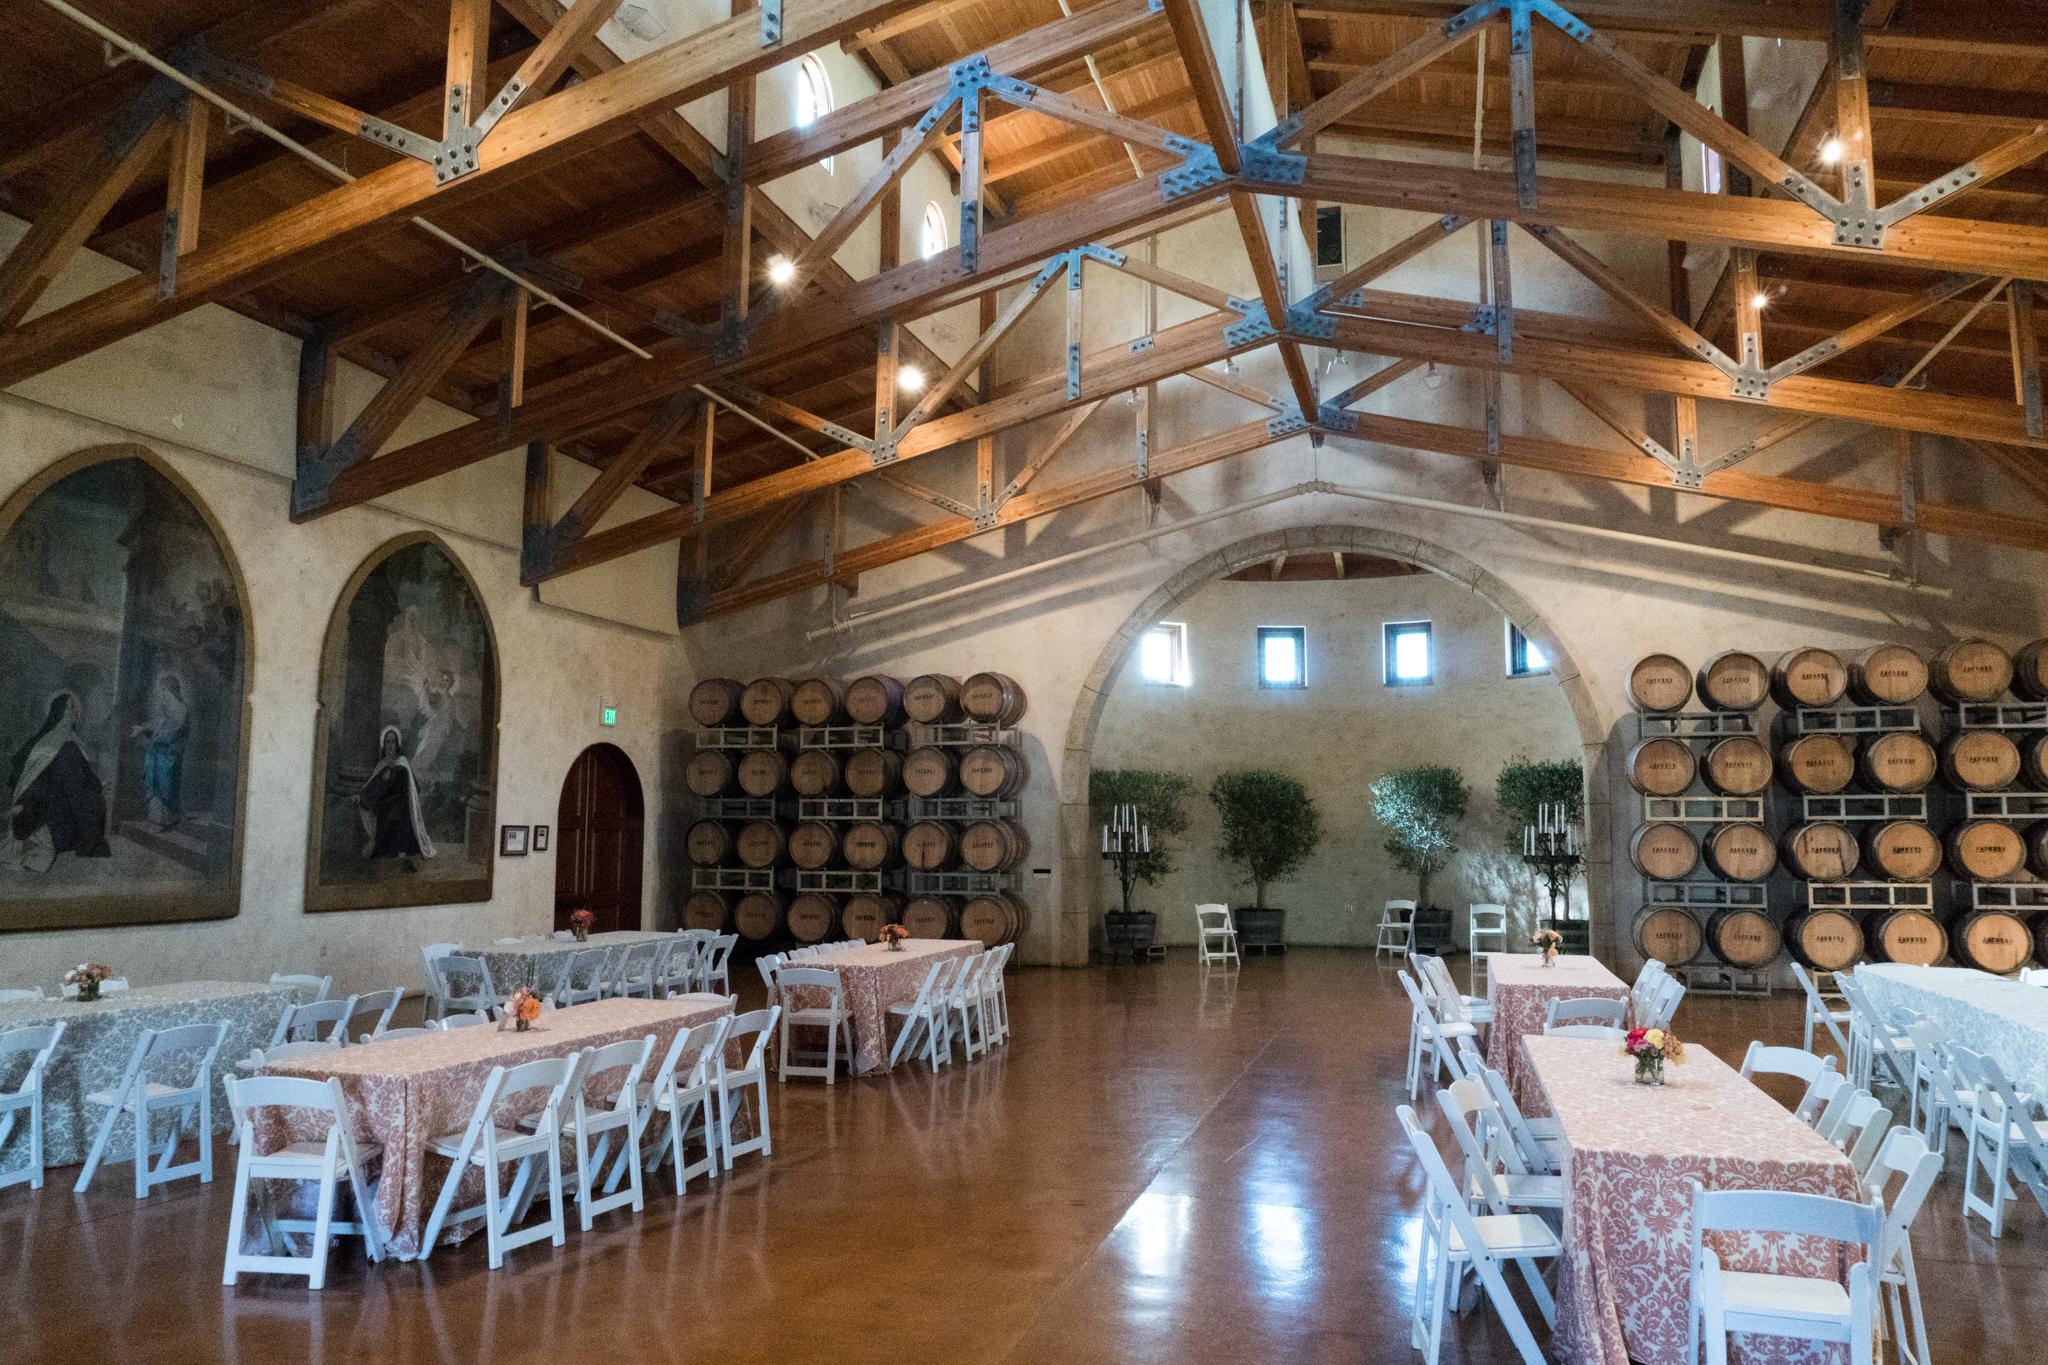 Jacuzzi Winery, Sonoma, CA